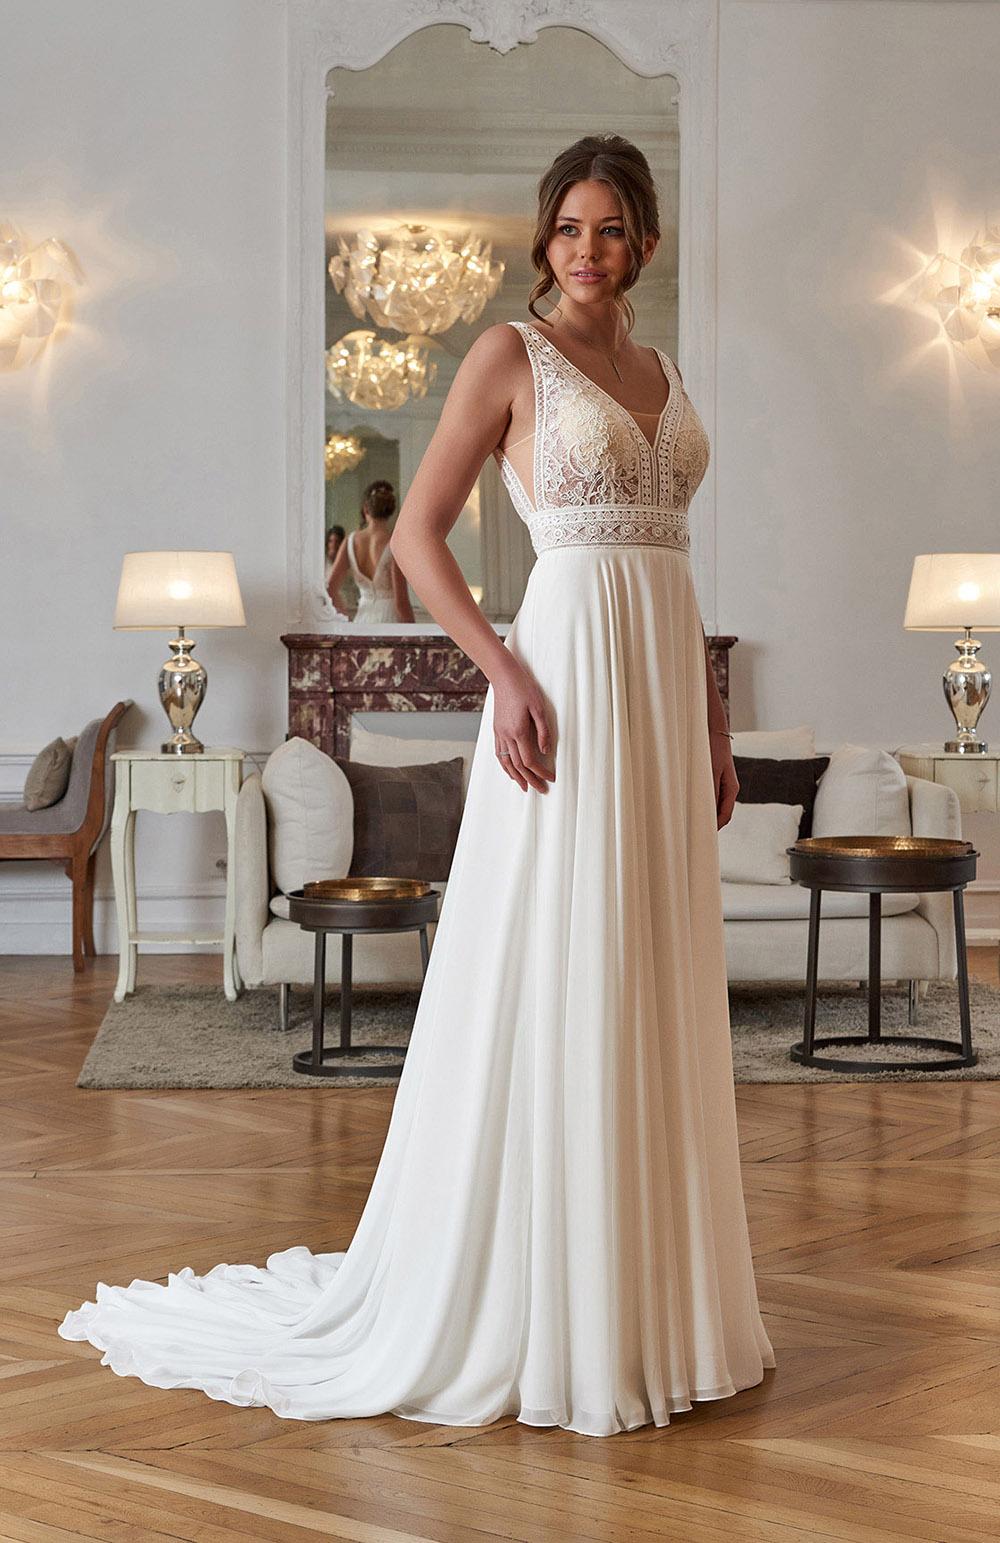 Robe de mariée Modèle Elenco